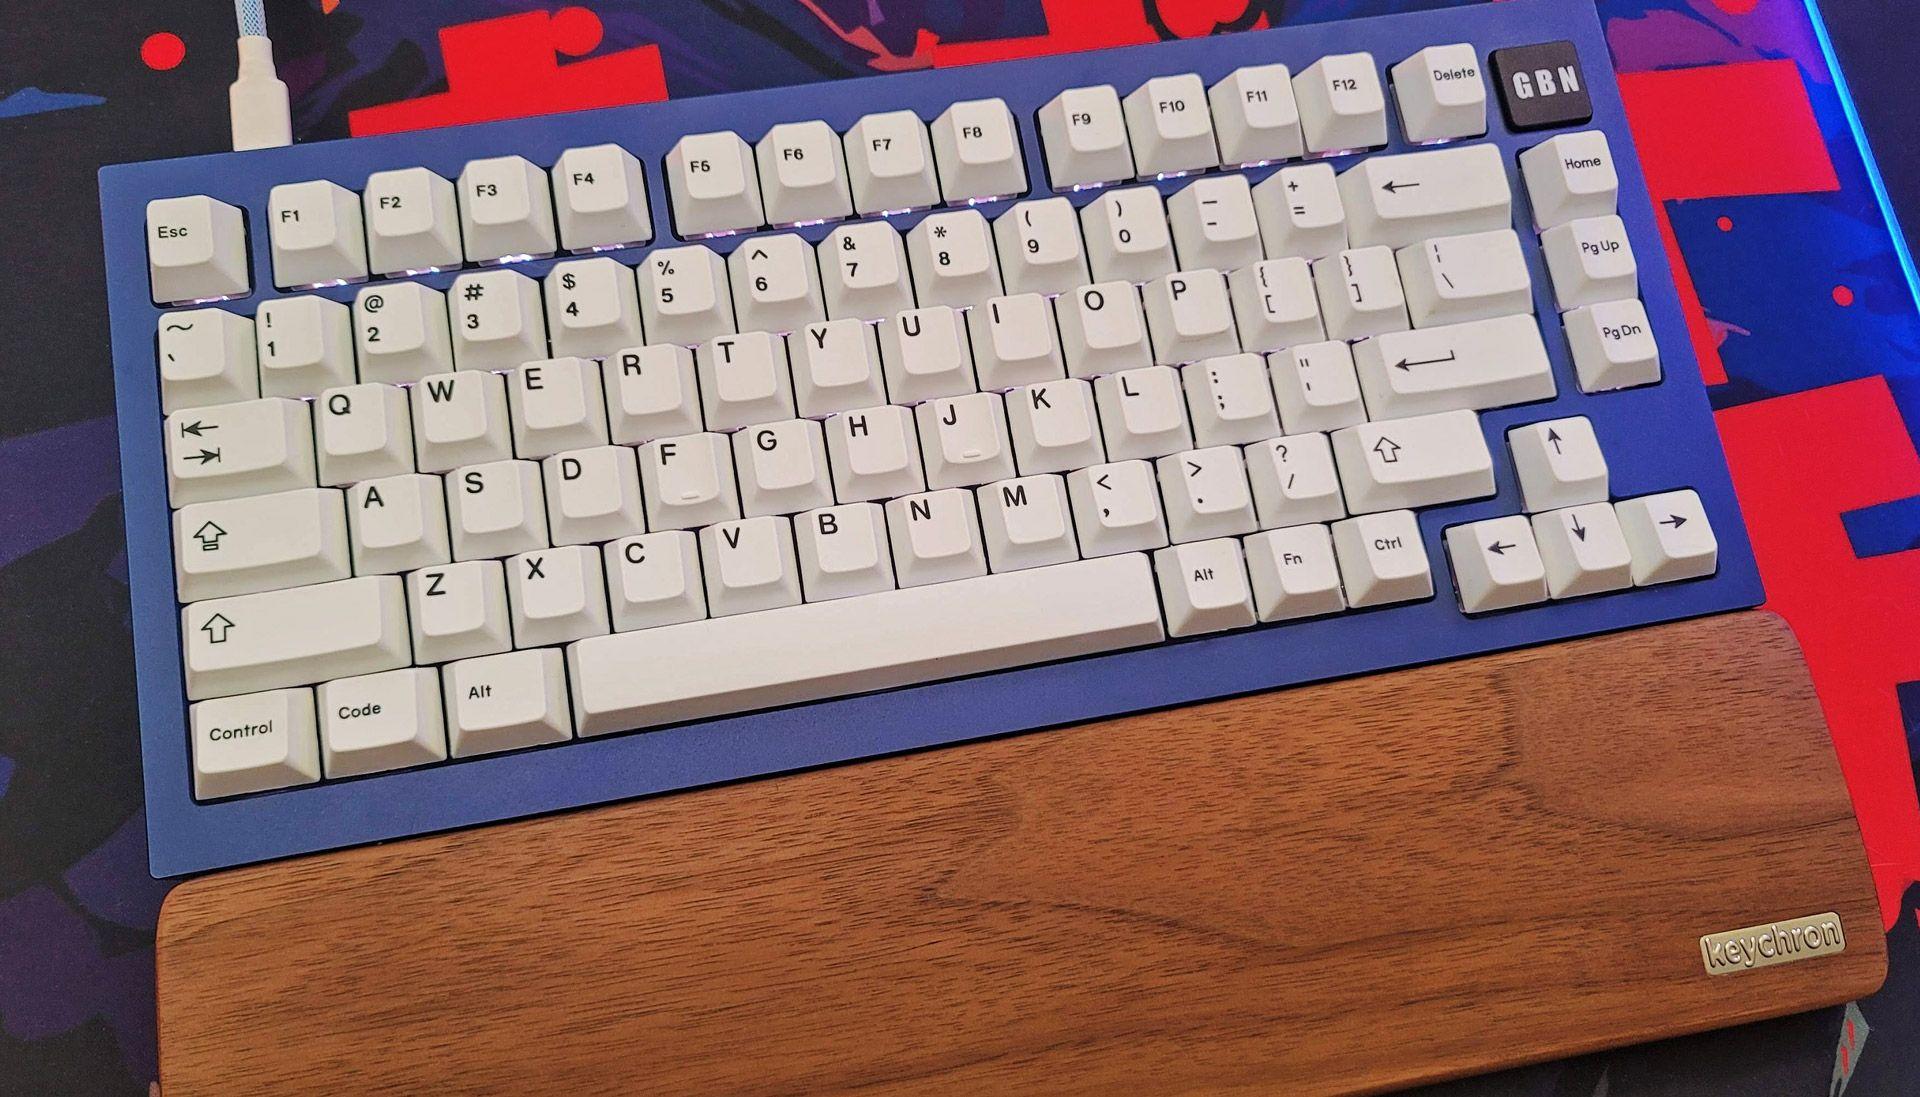 keychron-q1-custom-mechanical-keyboard-review:-a-must-buy